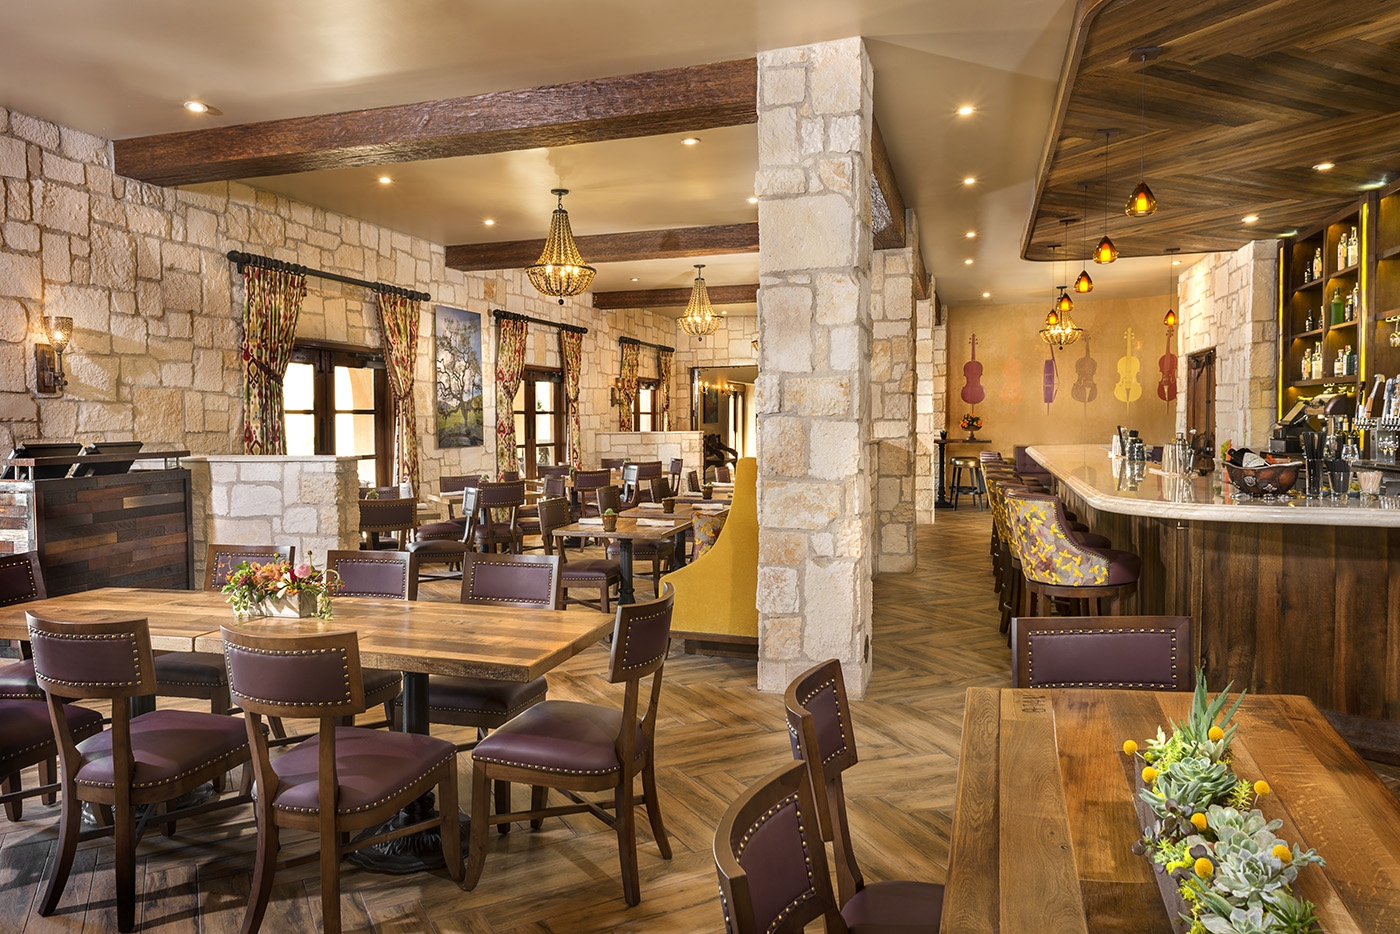 Restaurant at Allegretto Vineyard Resort in Paso Robles